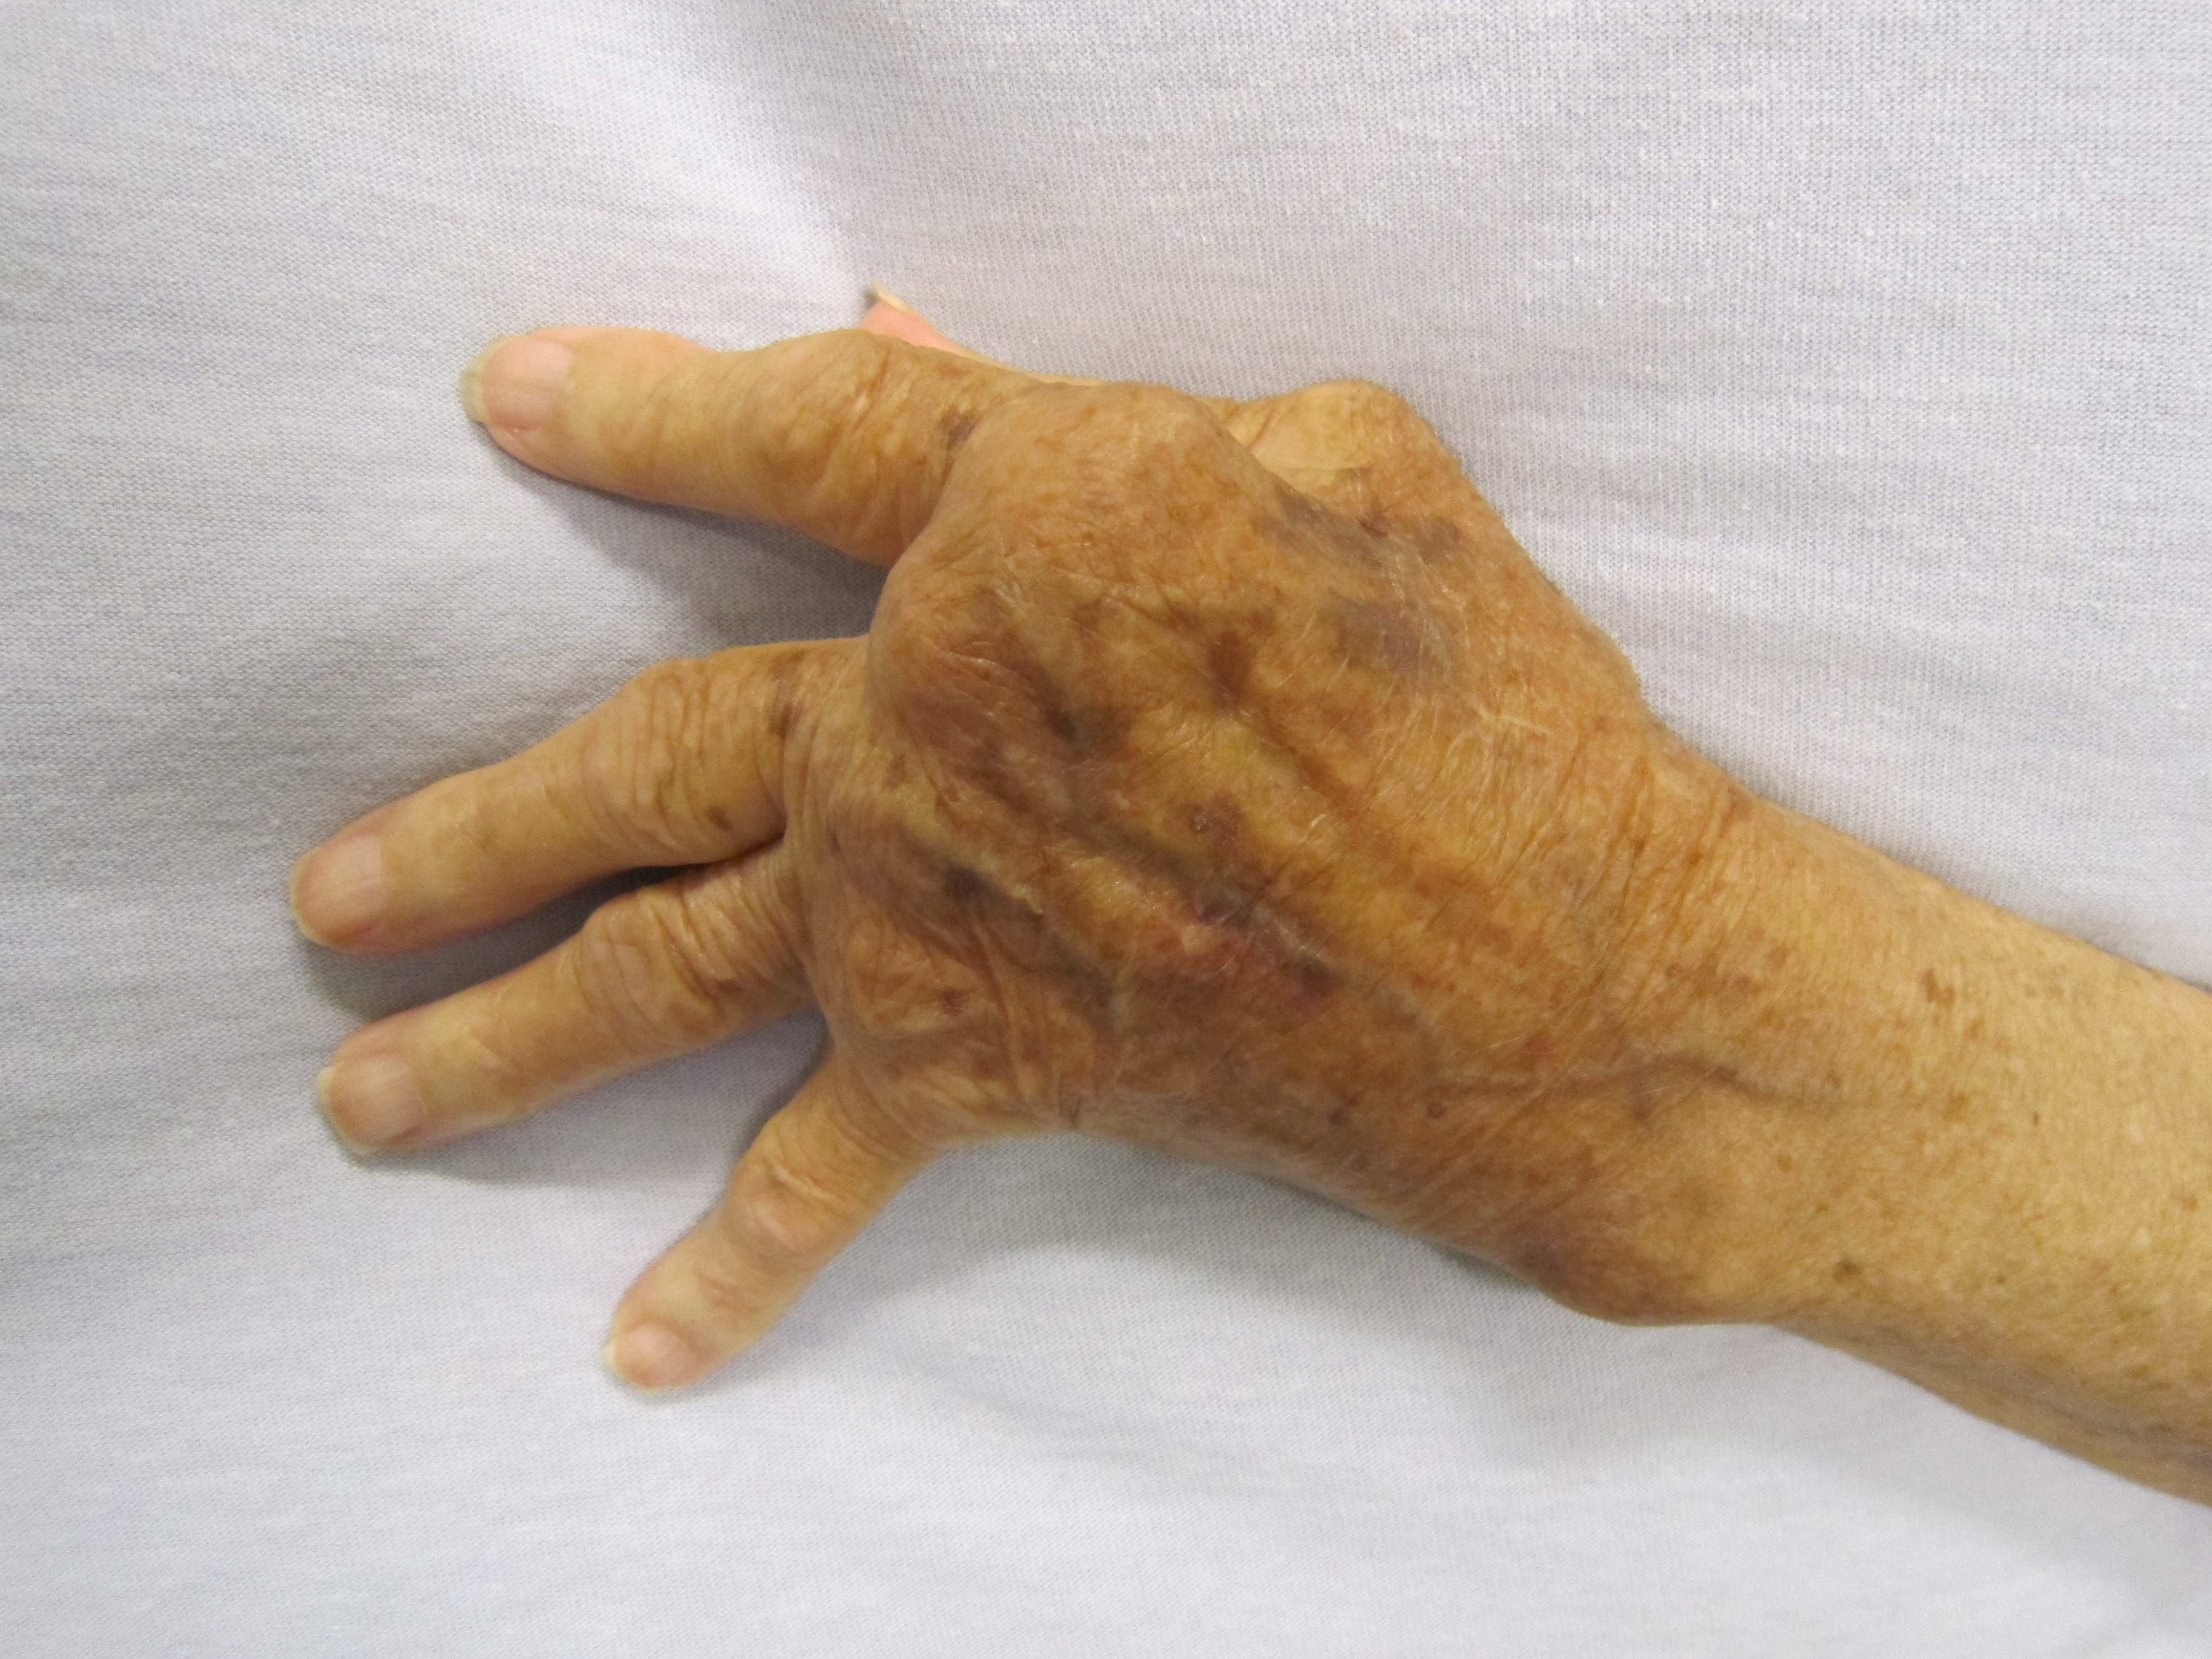 rheumatoid arthritis ahol kezelni